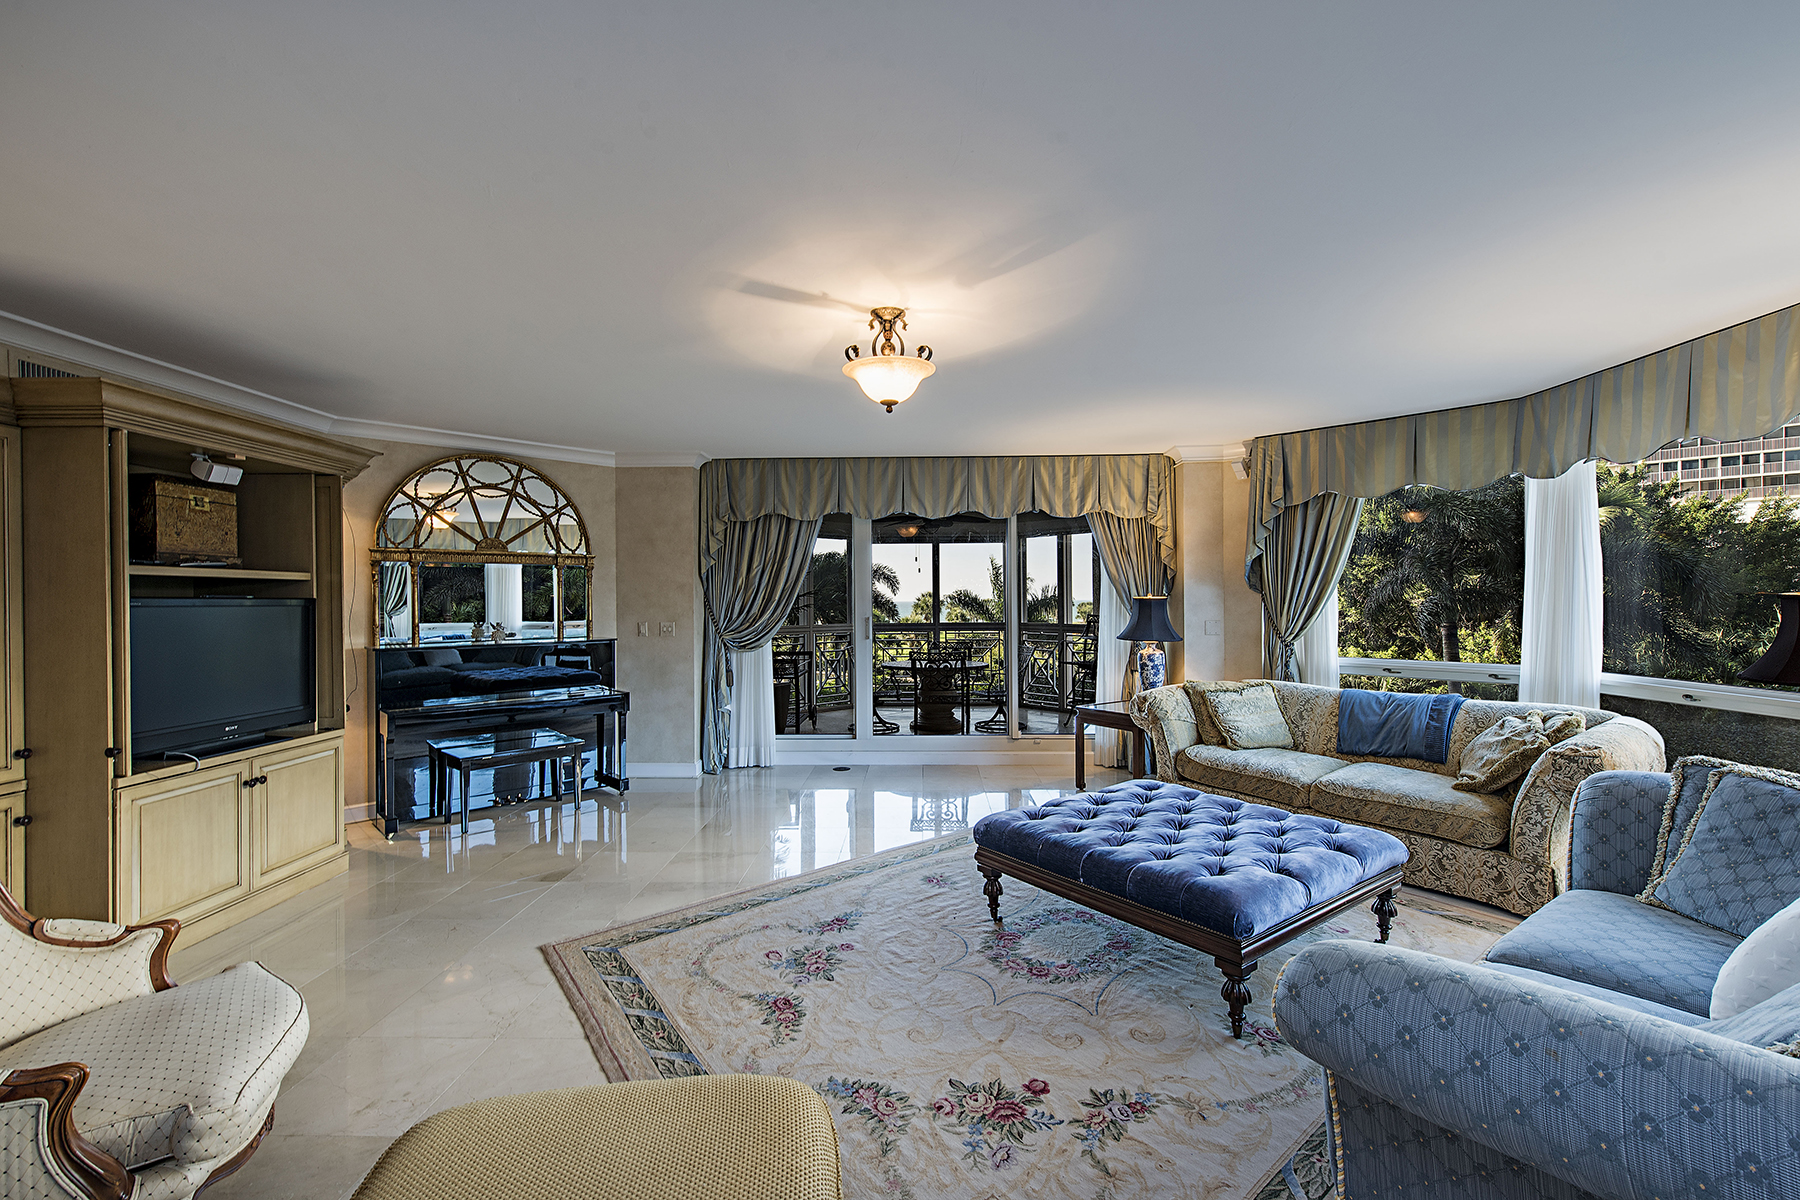 Condomínio para Venda às PARK SHORE - BRITTANY 4021 Gulf Shore Blvd N 206 Naples, Florida, 34103 Estados Unidos